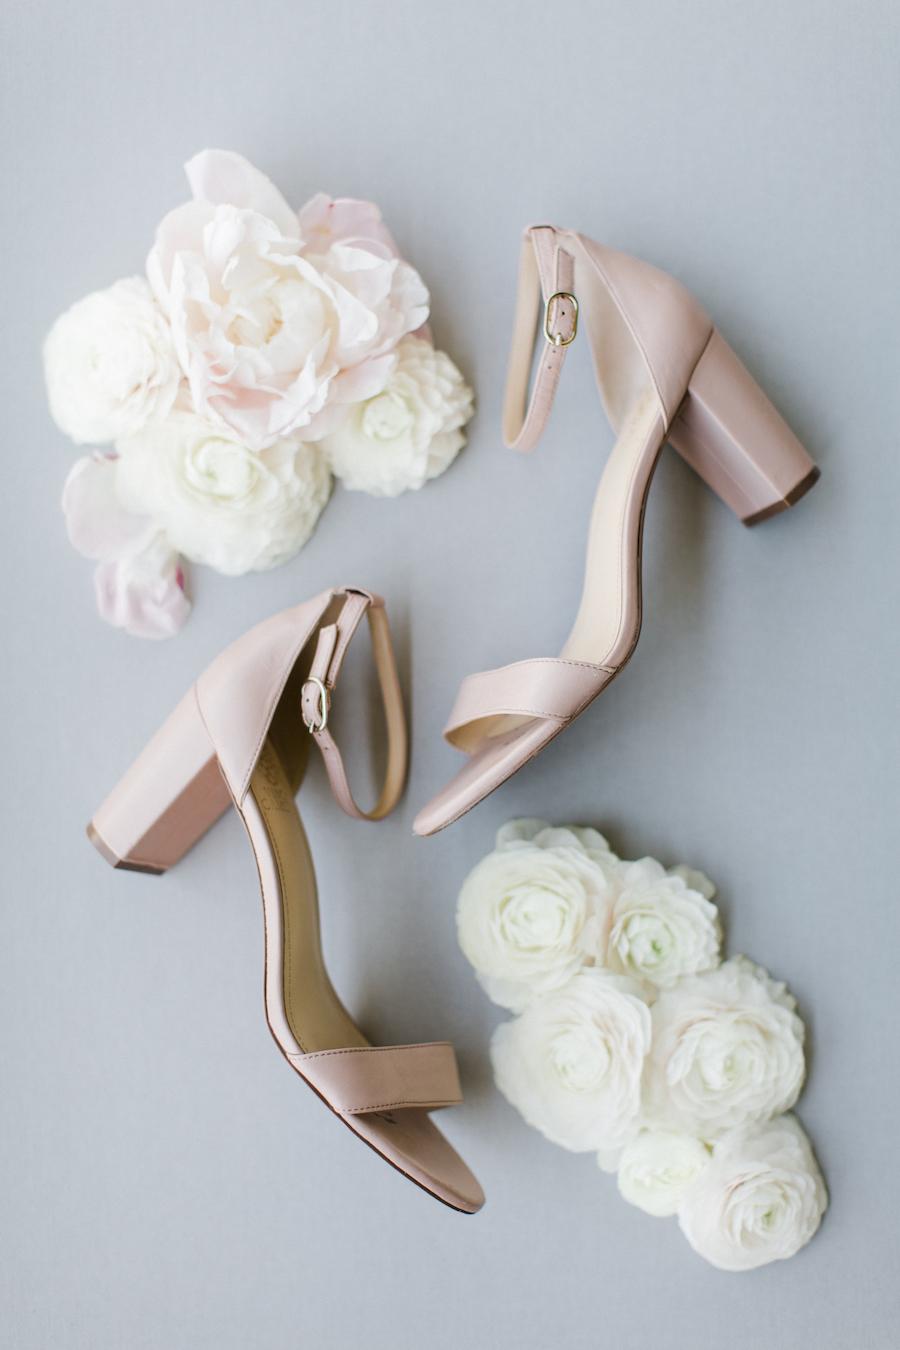 Blush wedding shoes